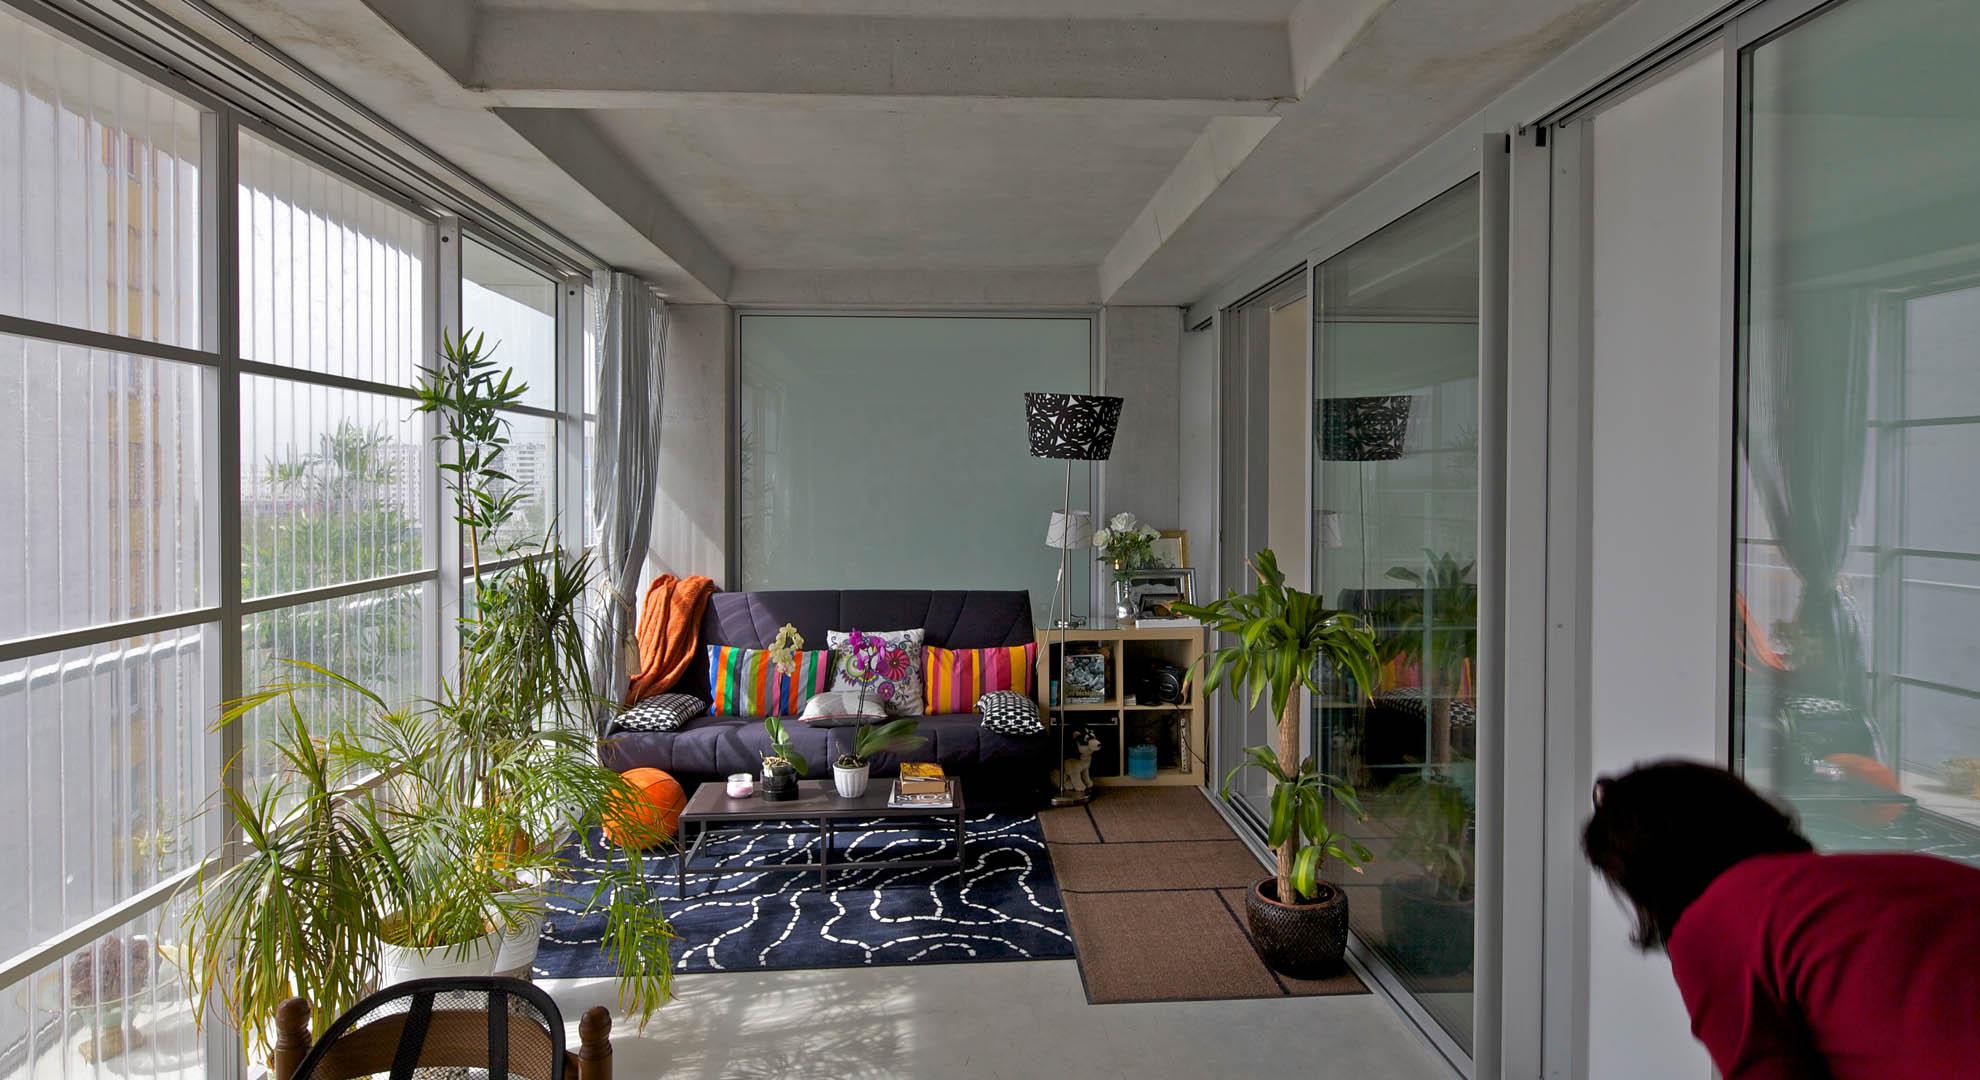 Inside a house in Bordeaux, France.